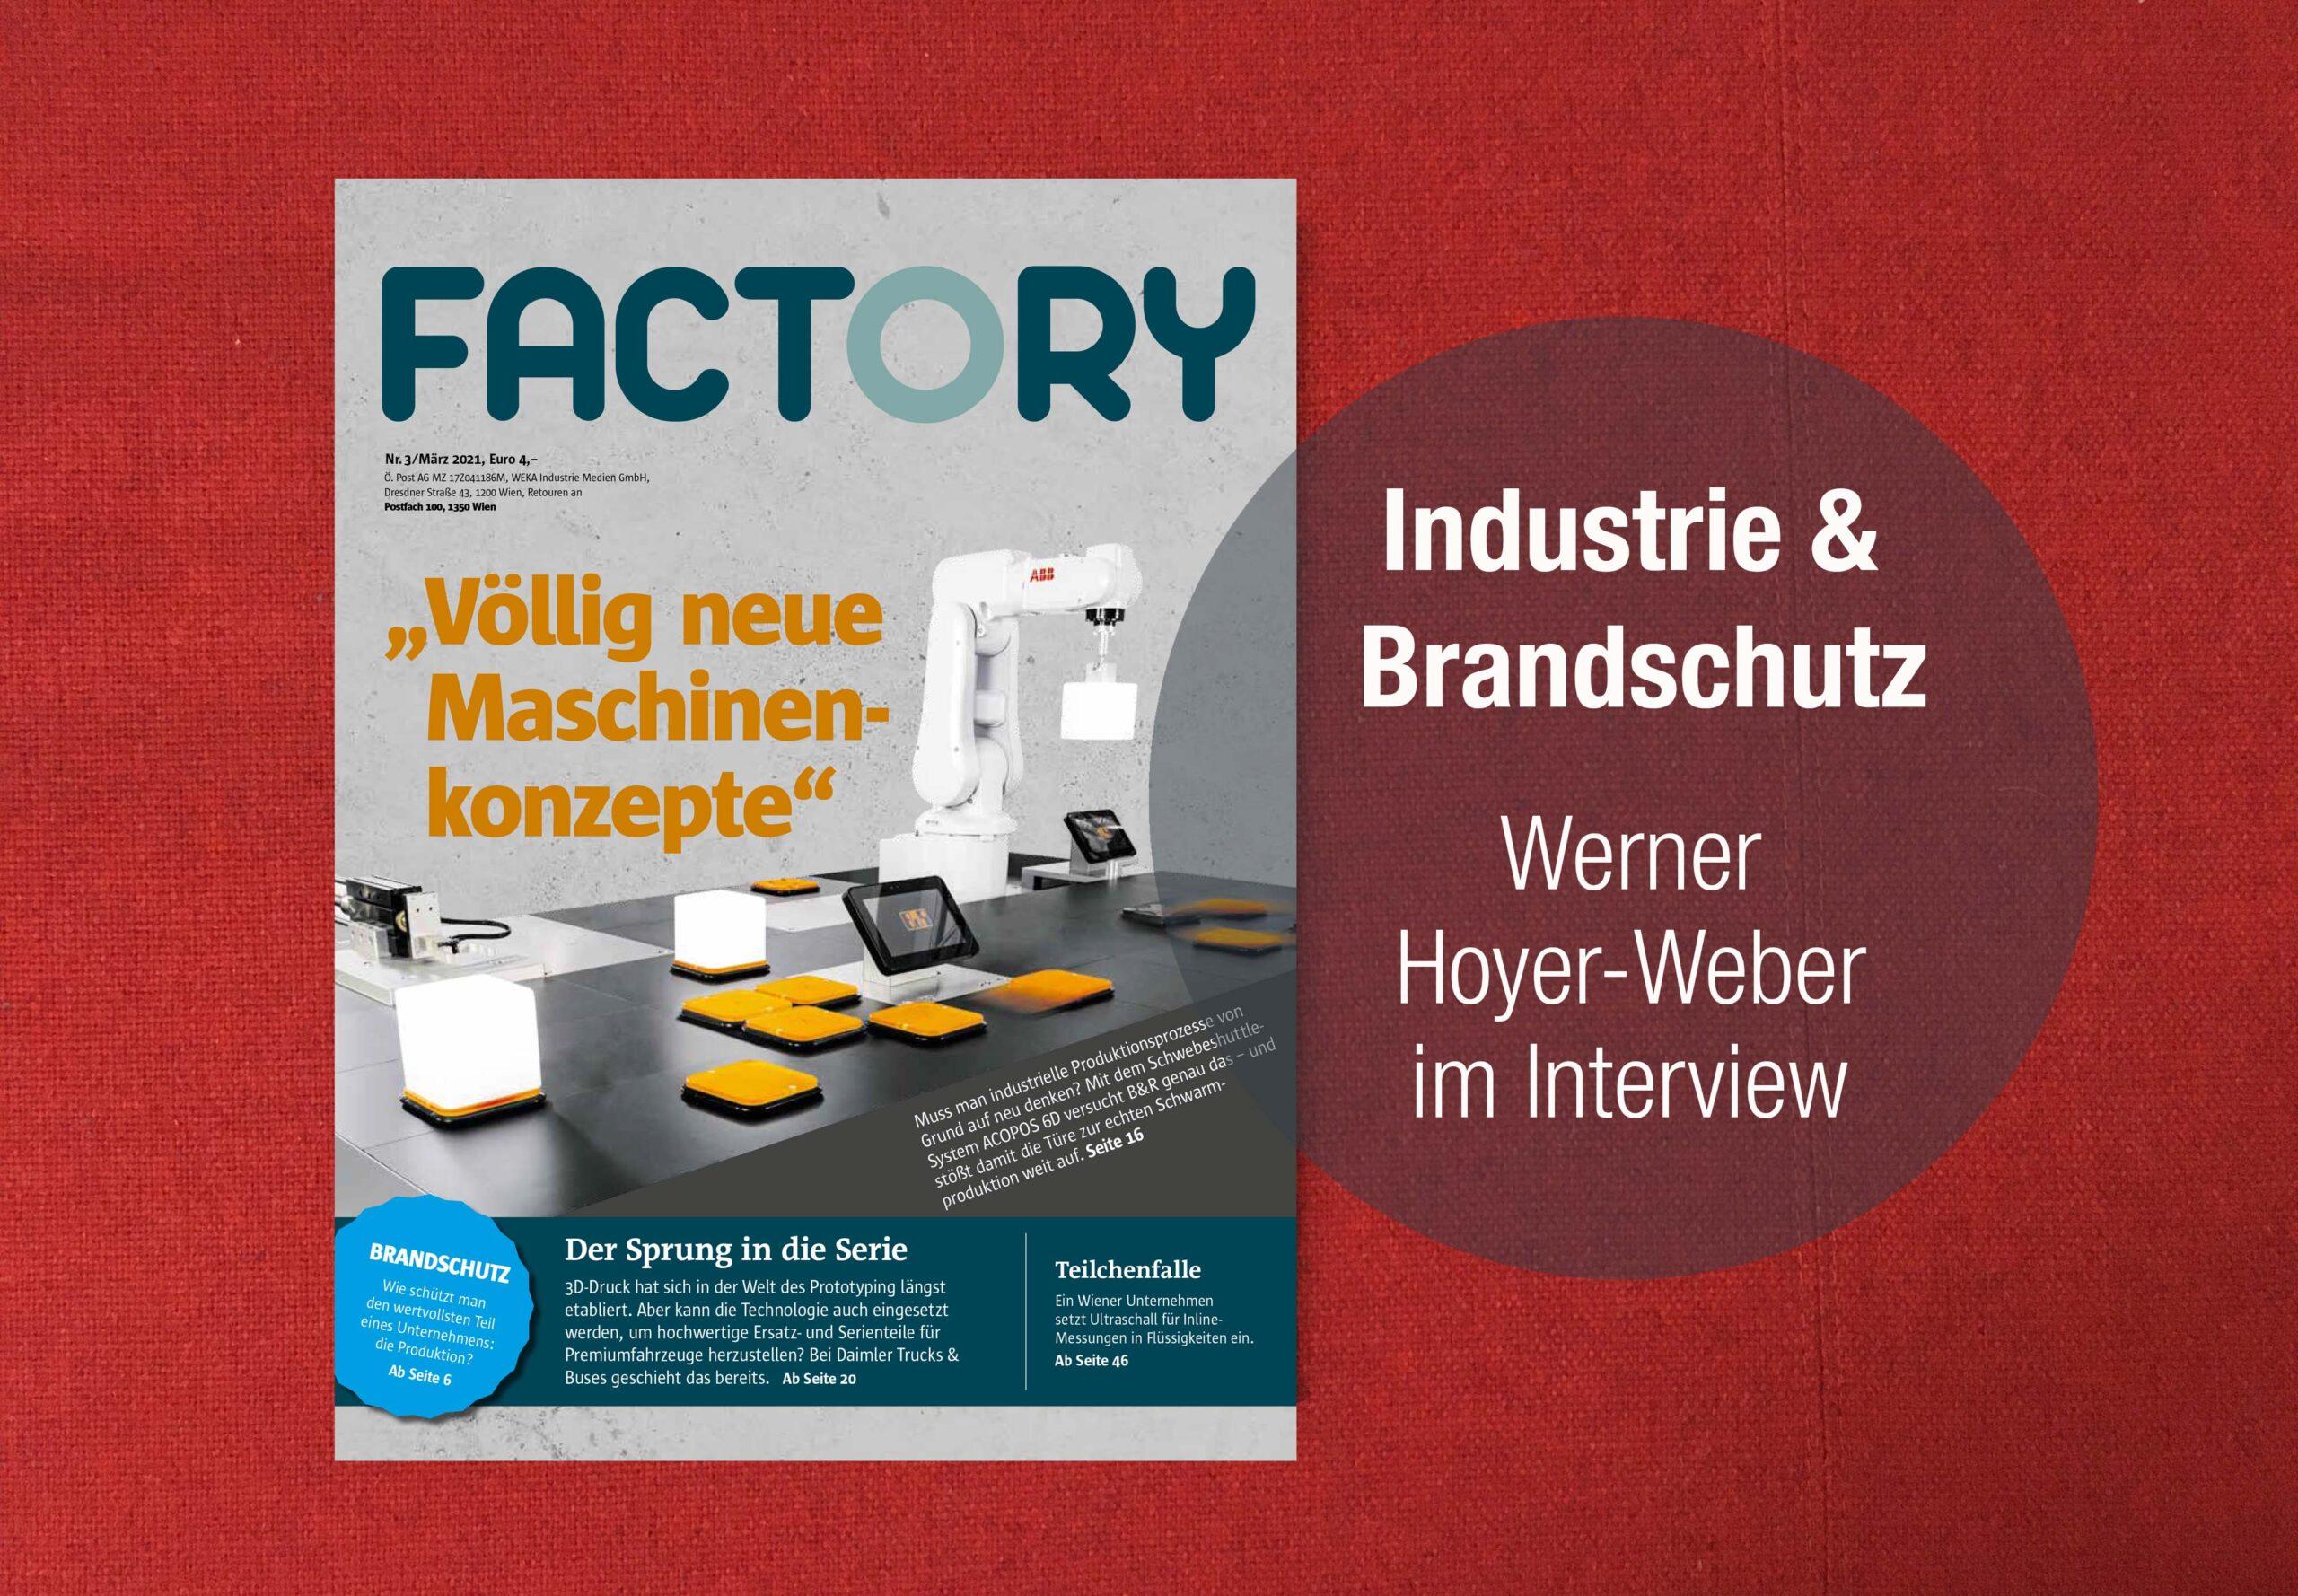 Das Cover des Magazins Factory